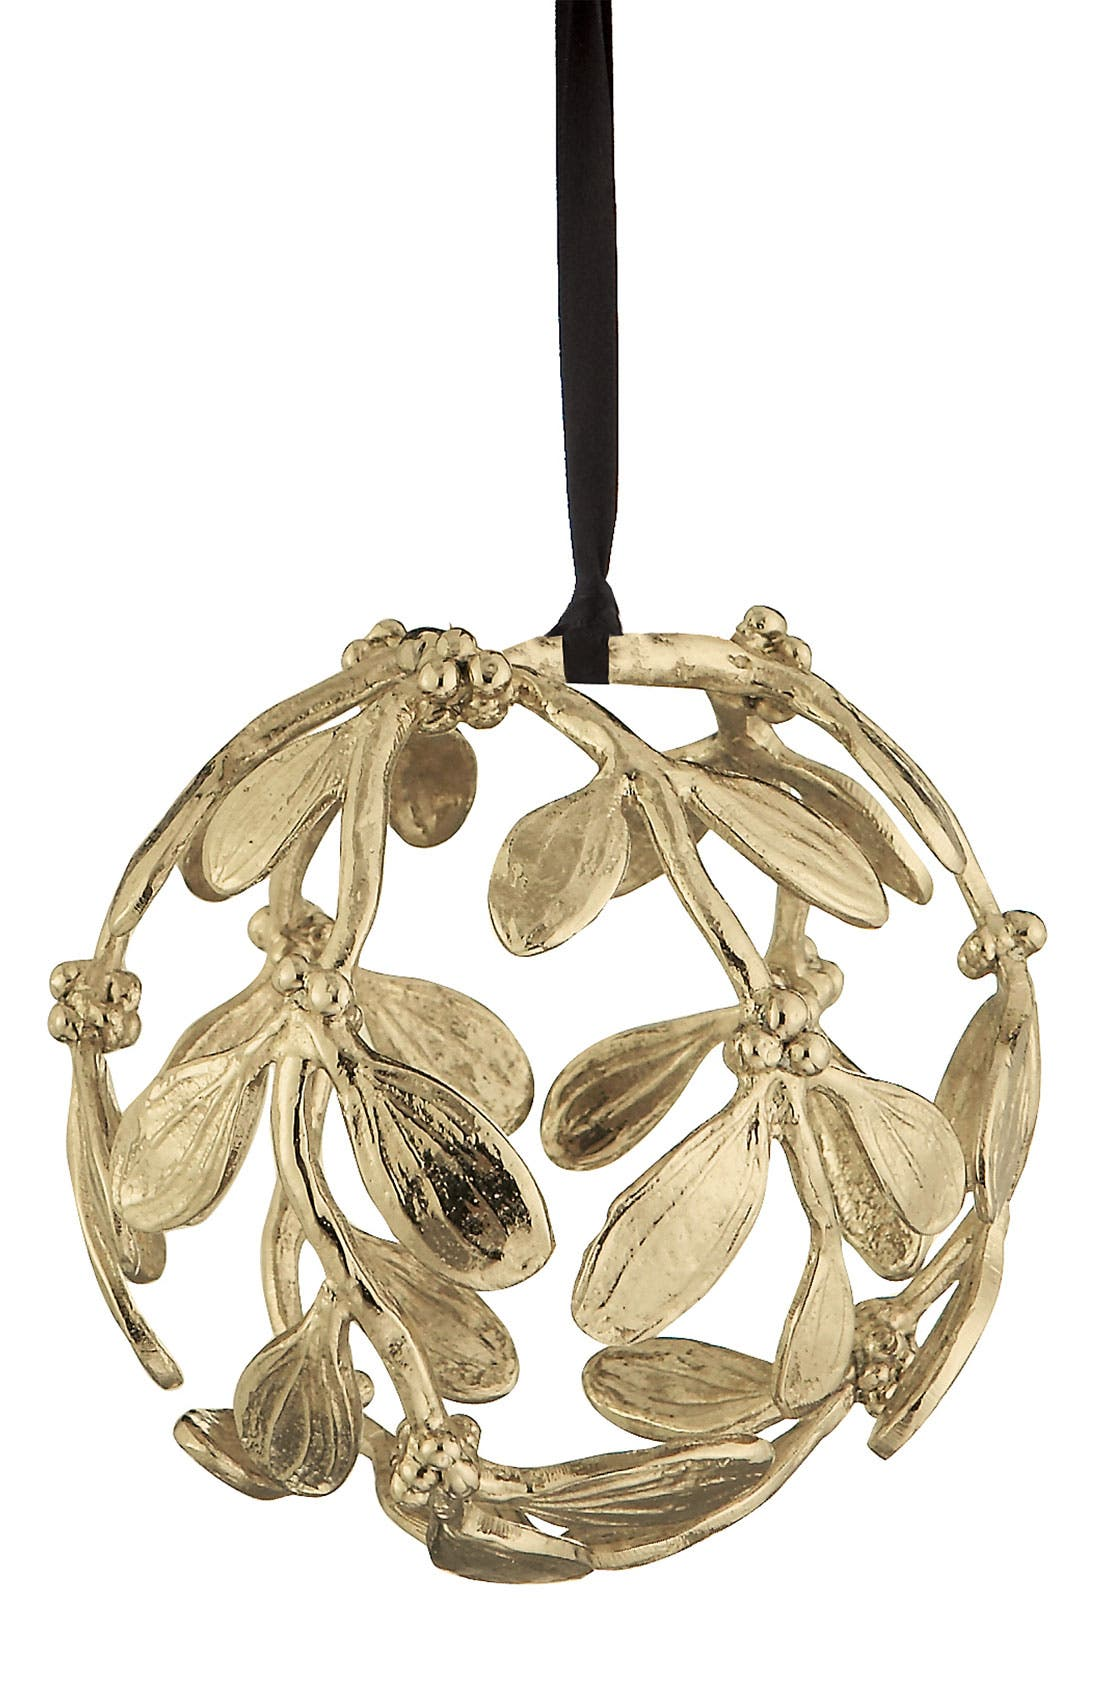 Main Image - Michael Aram Mistletoe Globe Ornament